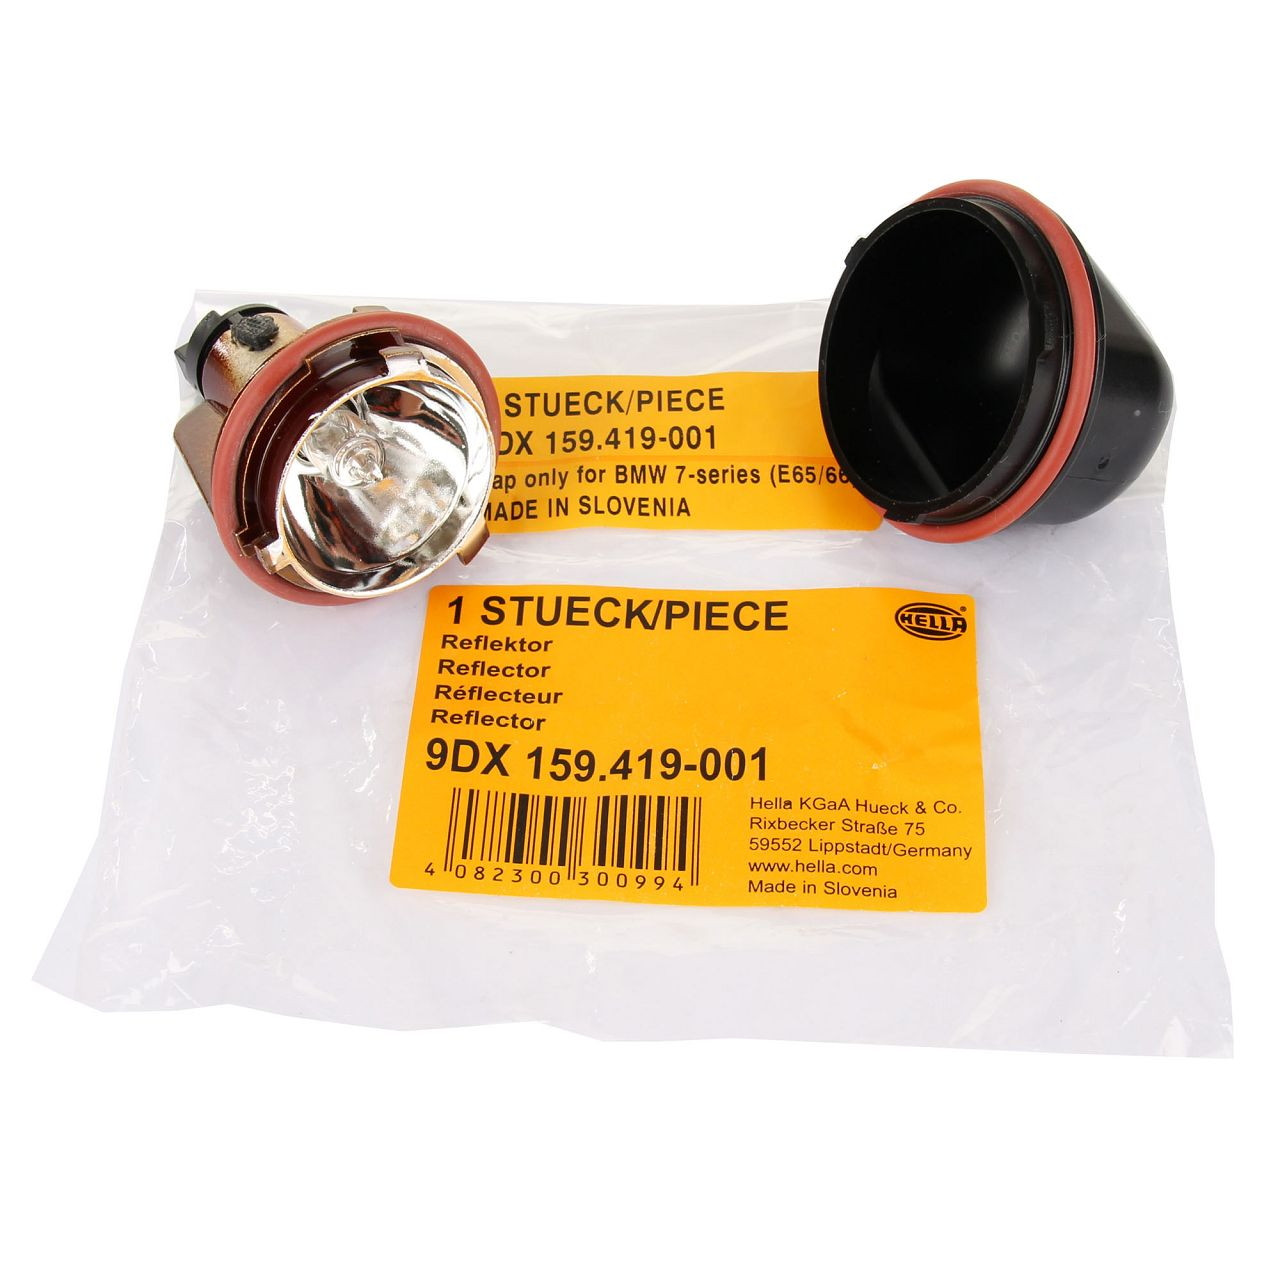 HELLA Halogenlampe Reflektor Positions- Begrenzungsleuchte BMW E60 E61 E65-67 X5 E53